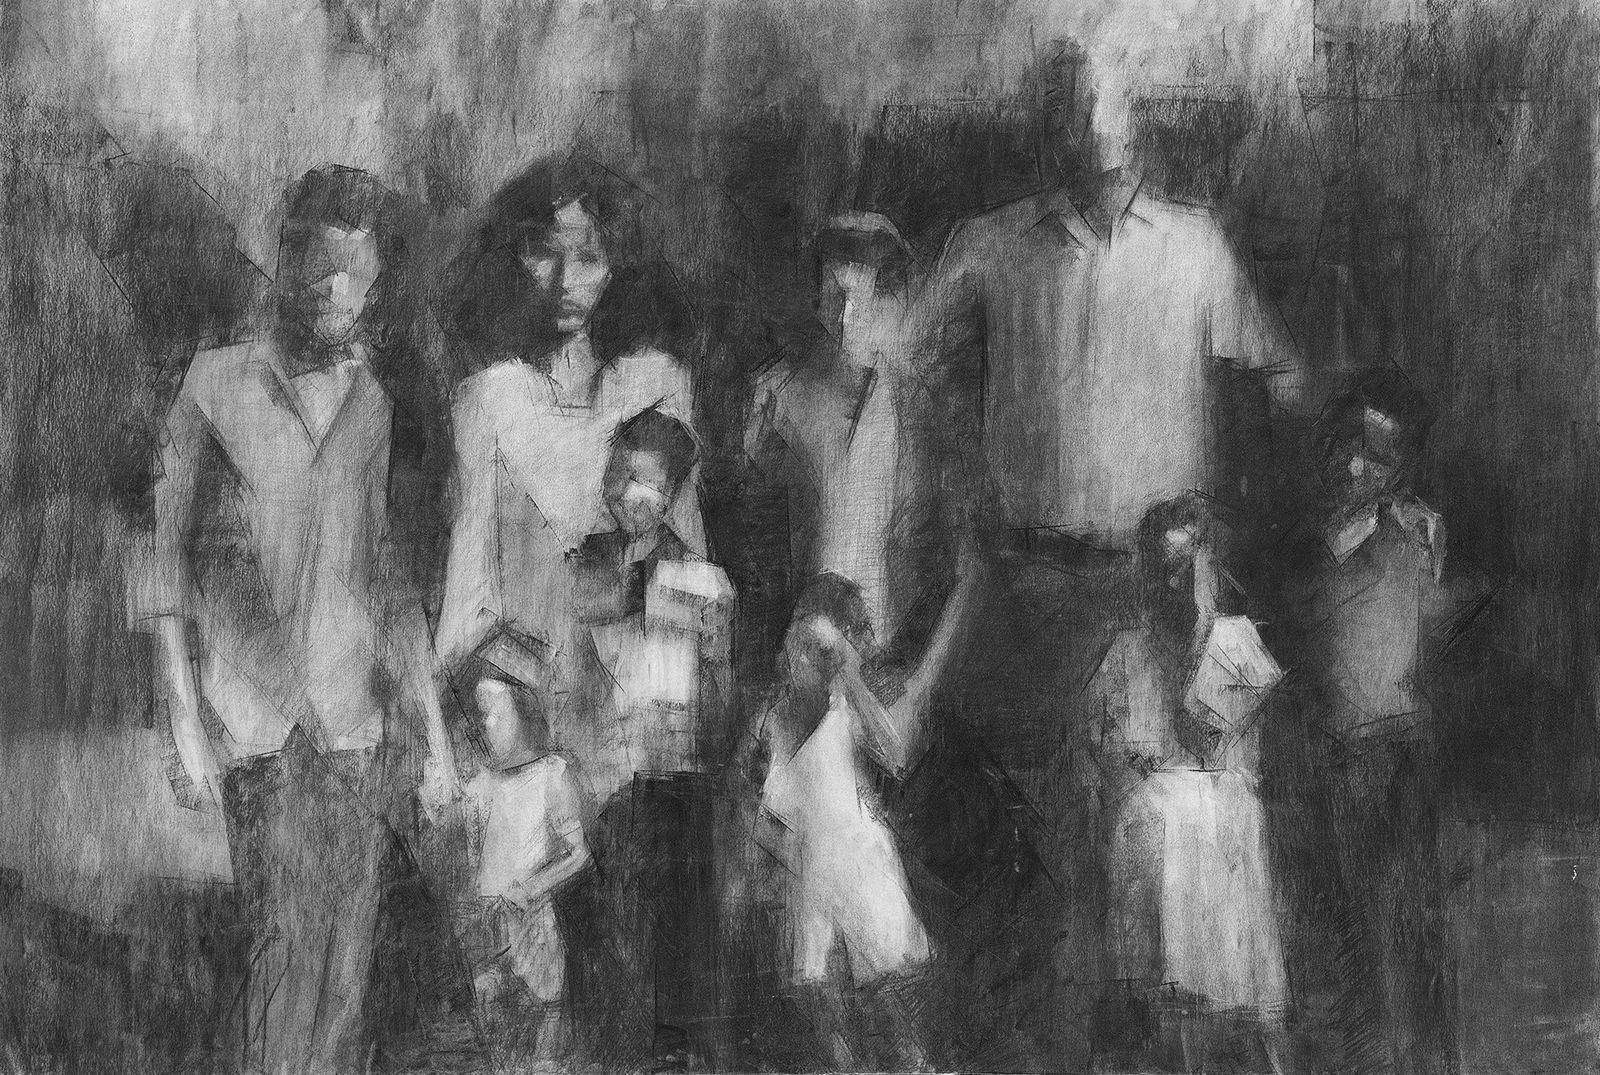 Atlit-2019-Charcoal-on-paper-118×80-cm